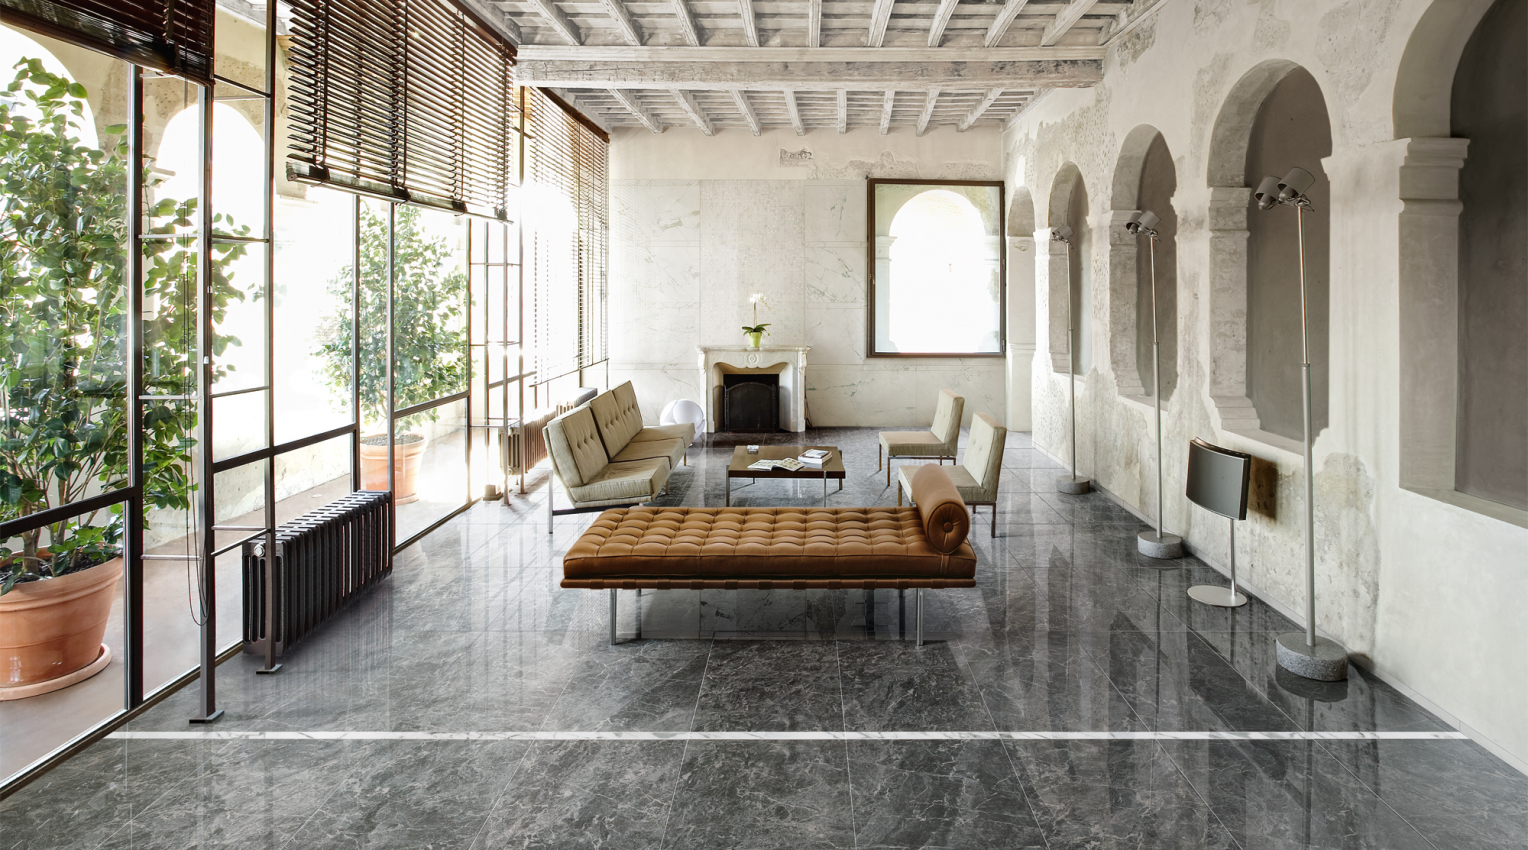 Lantai Marble pada Ruangan Rumah